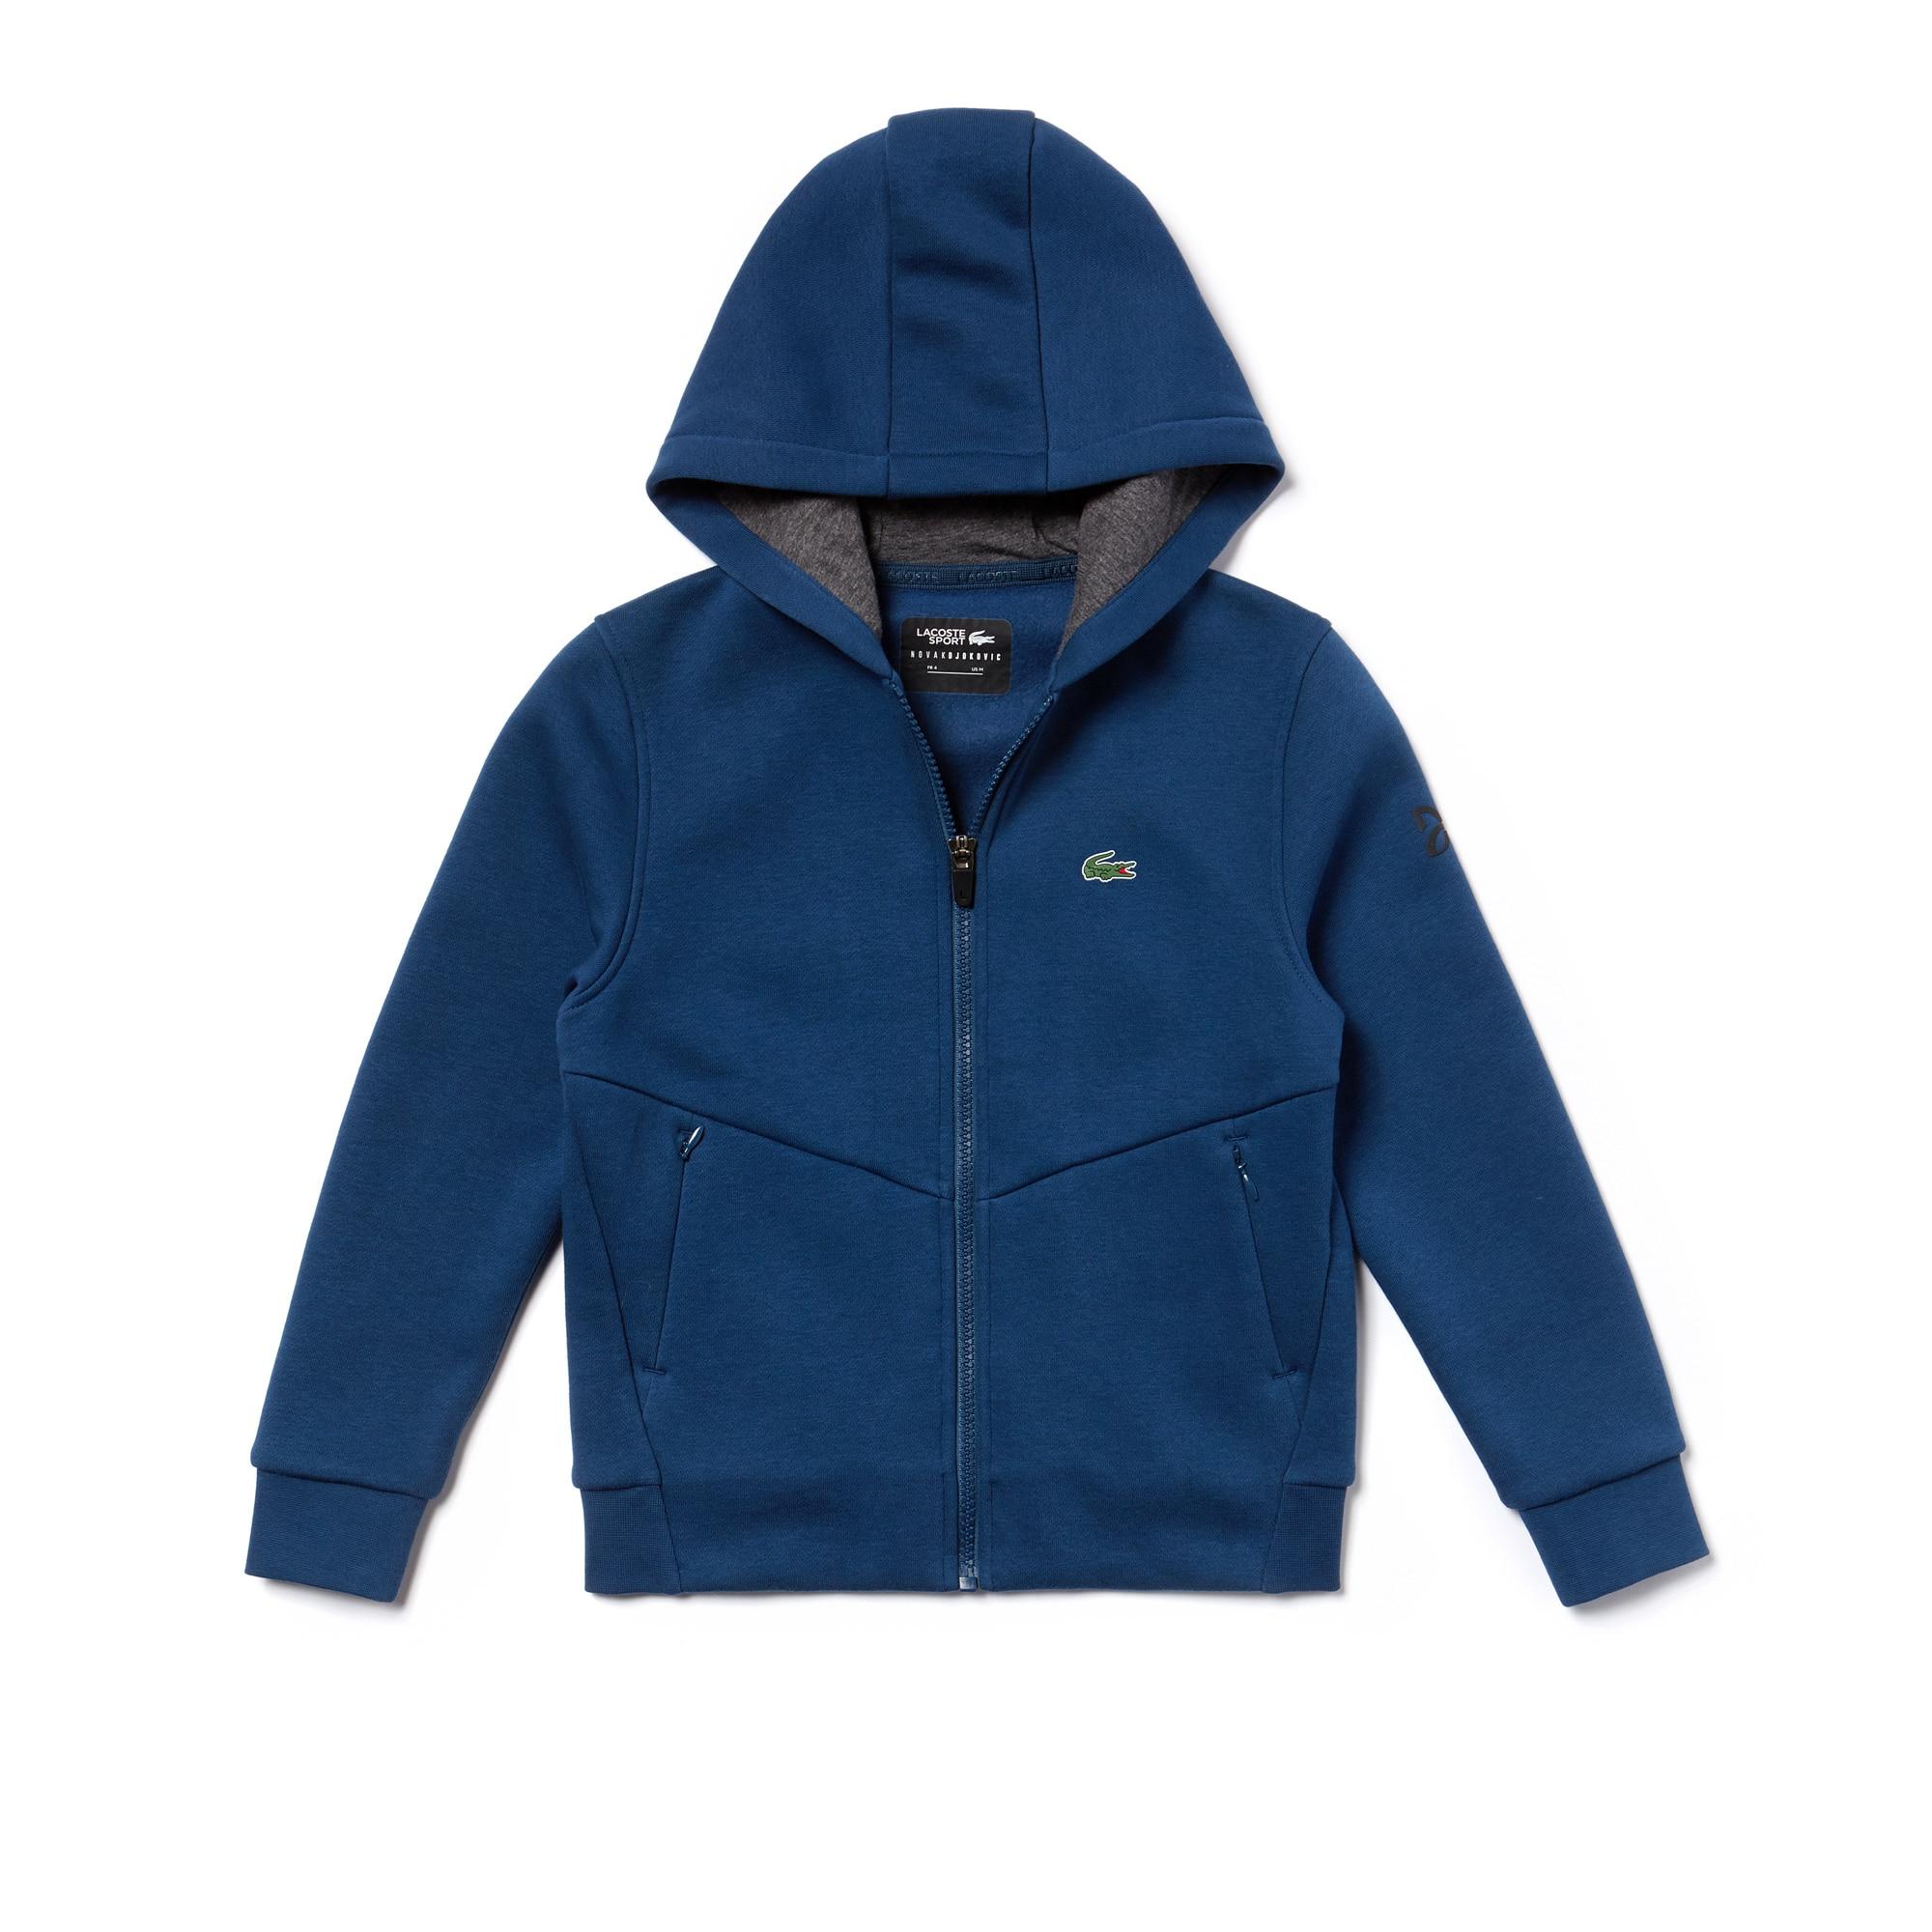 Boys' Lacoste SPORT NOVAK DJOKOVIC-OFF COURT COLLECTION Zip Technical Fleece Sweatshirt